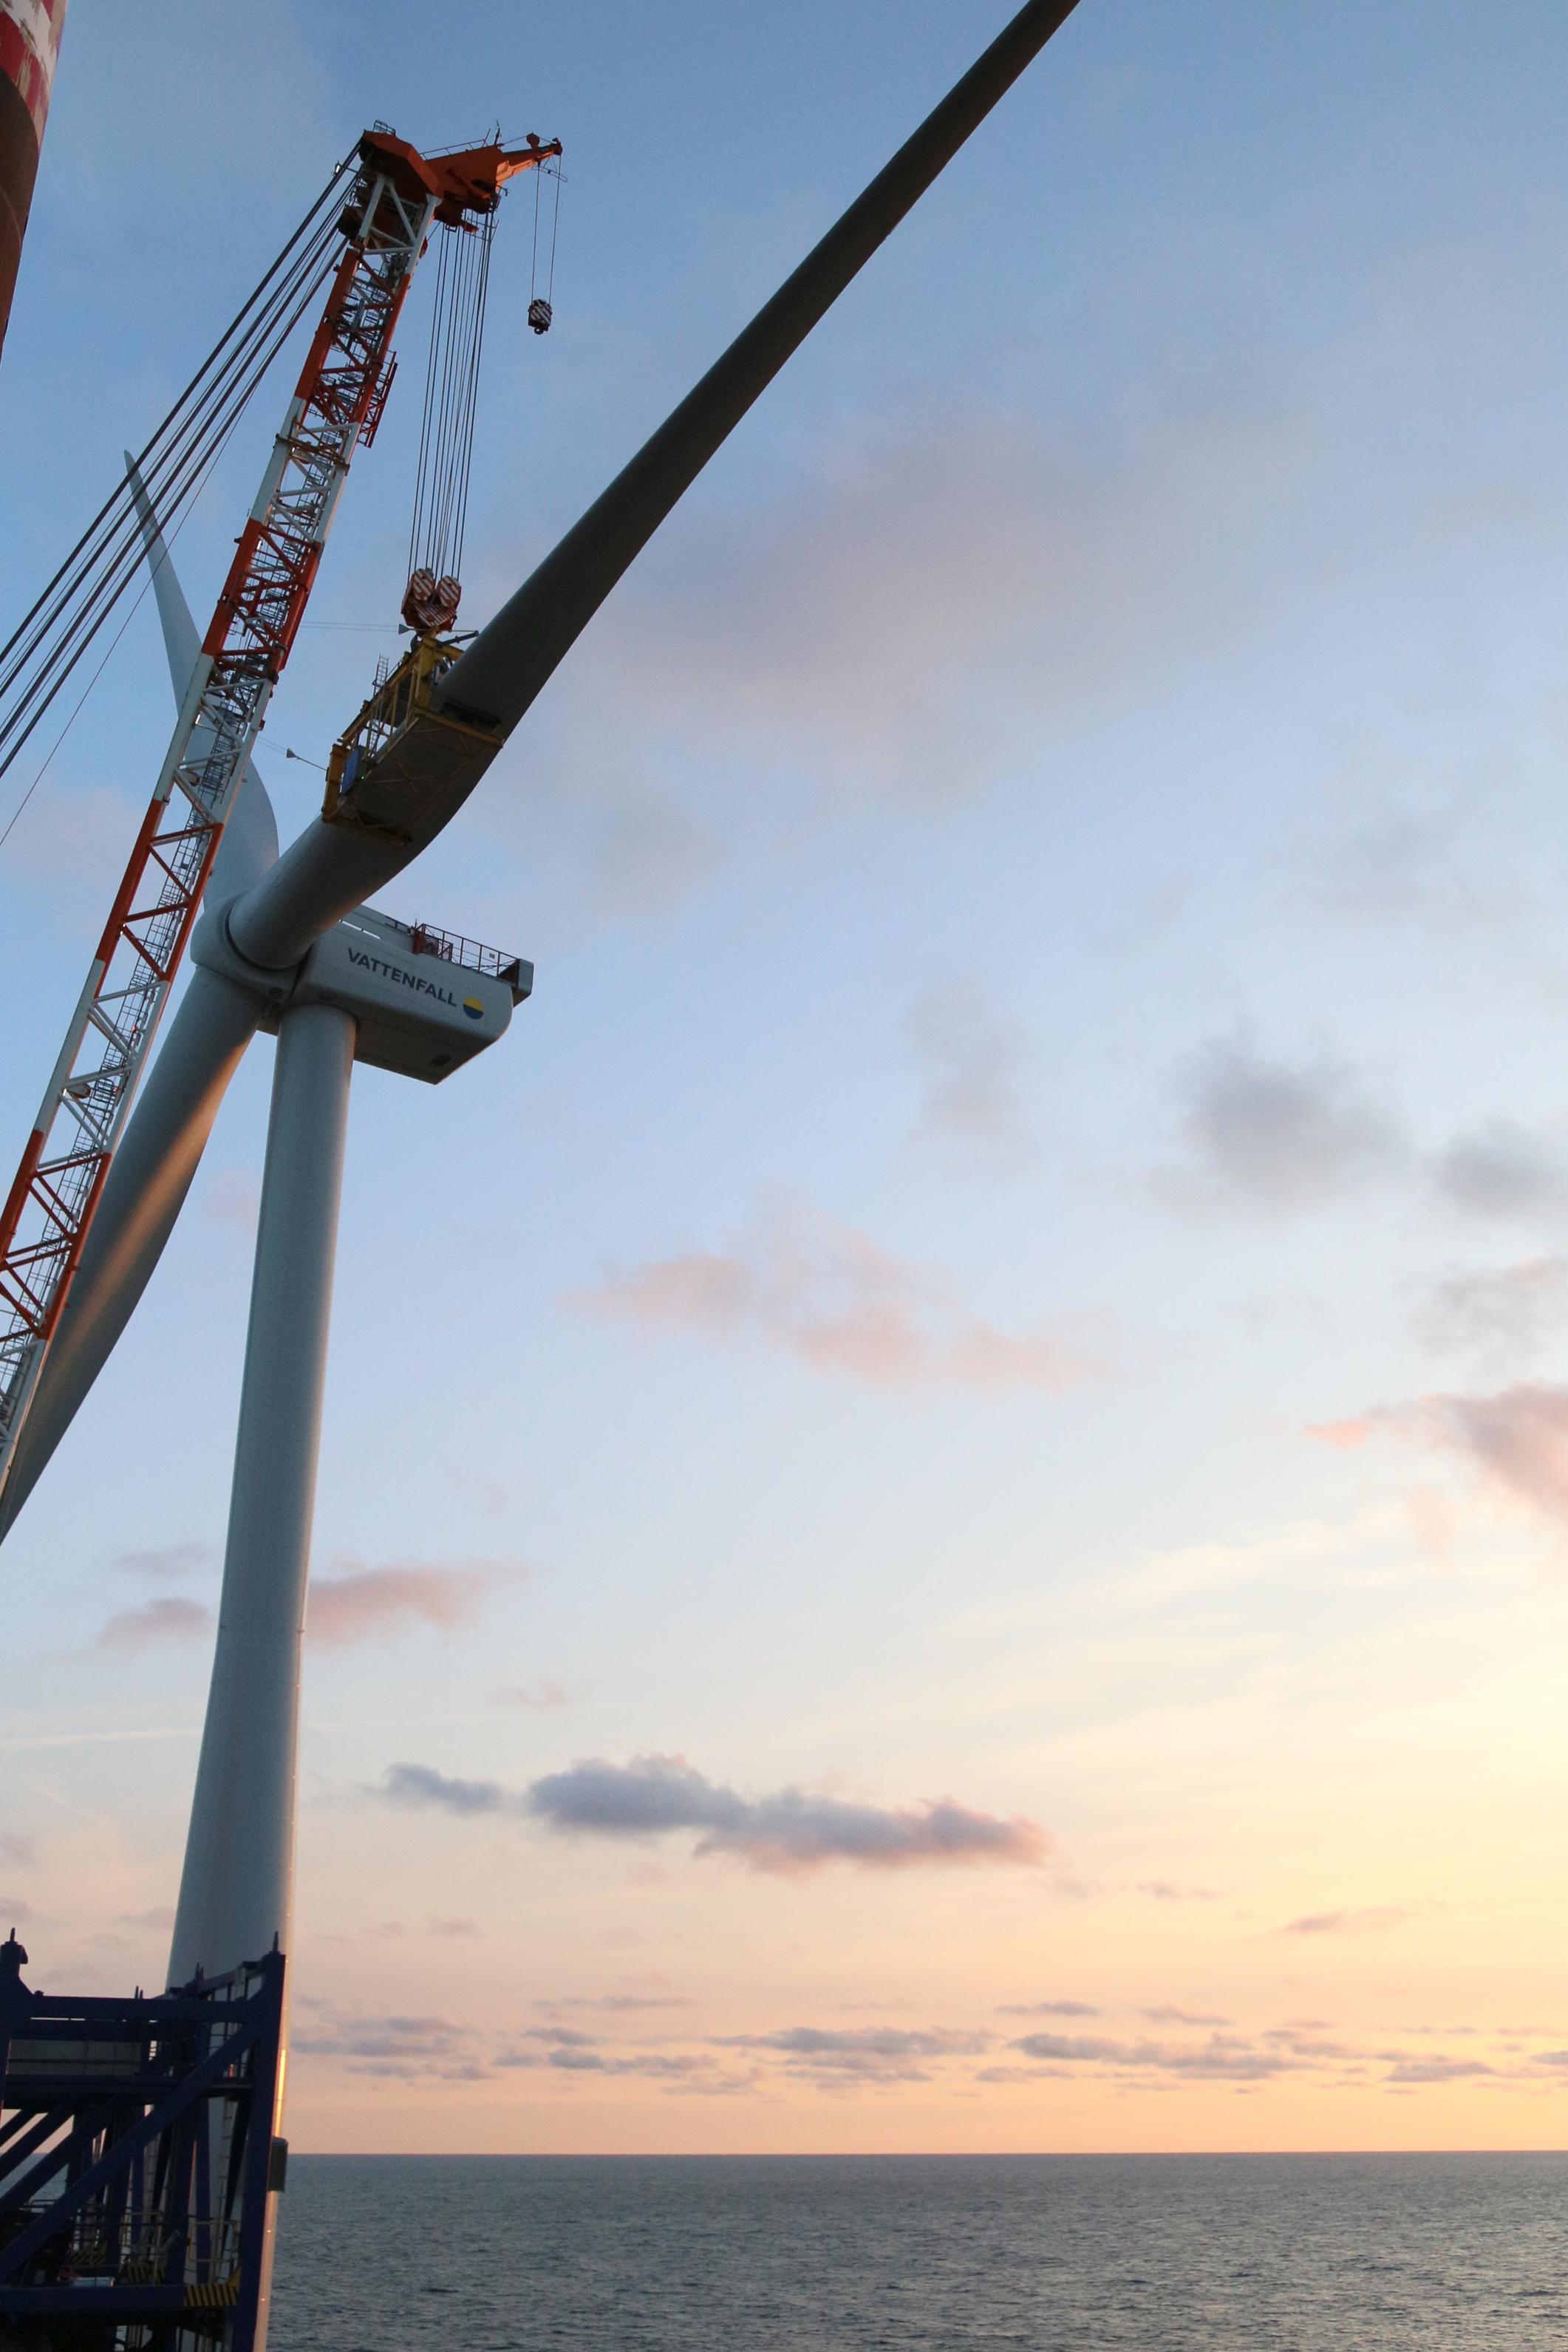 First turbine installed